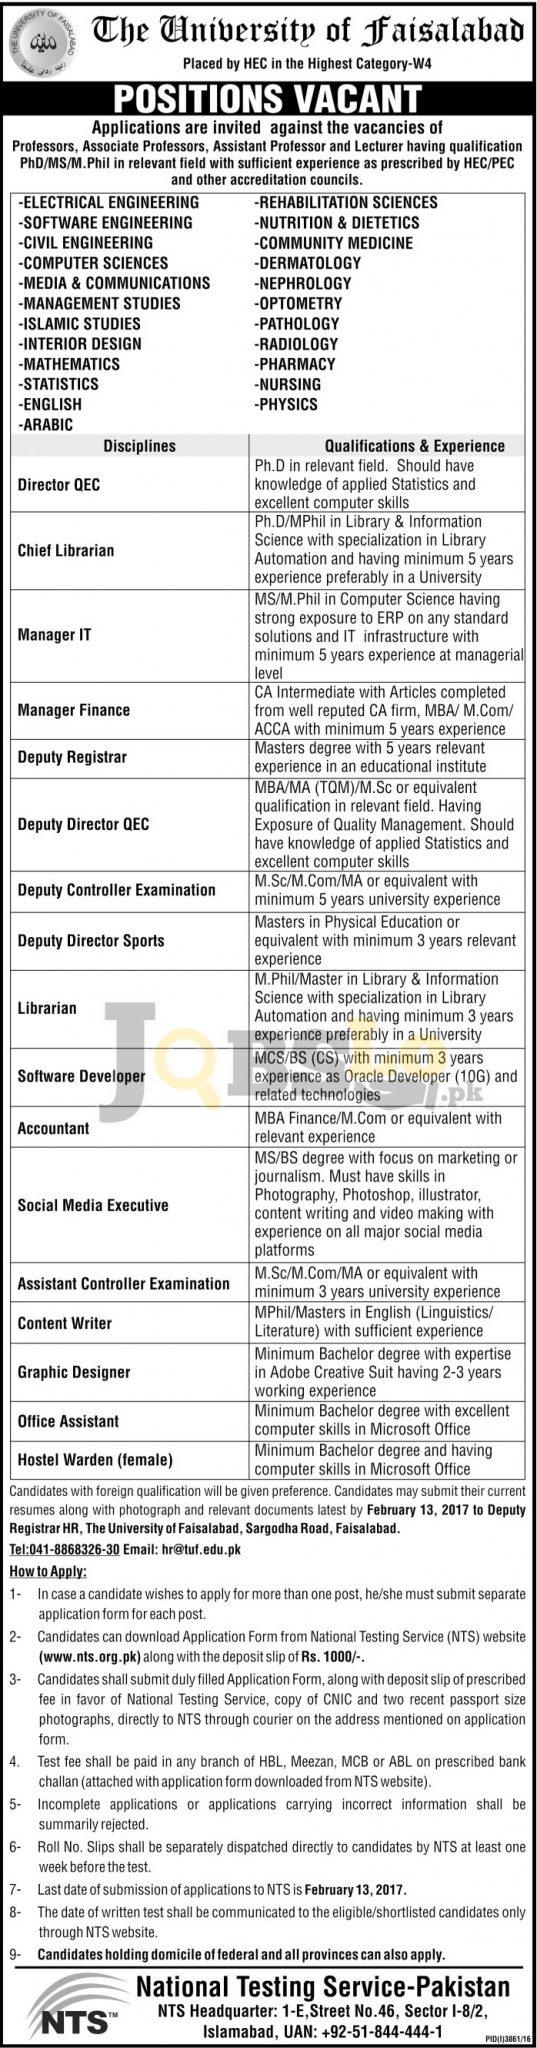 University of Faisalabad Jobs 2017 NTS Online Application Form nts.org.pk